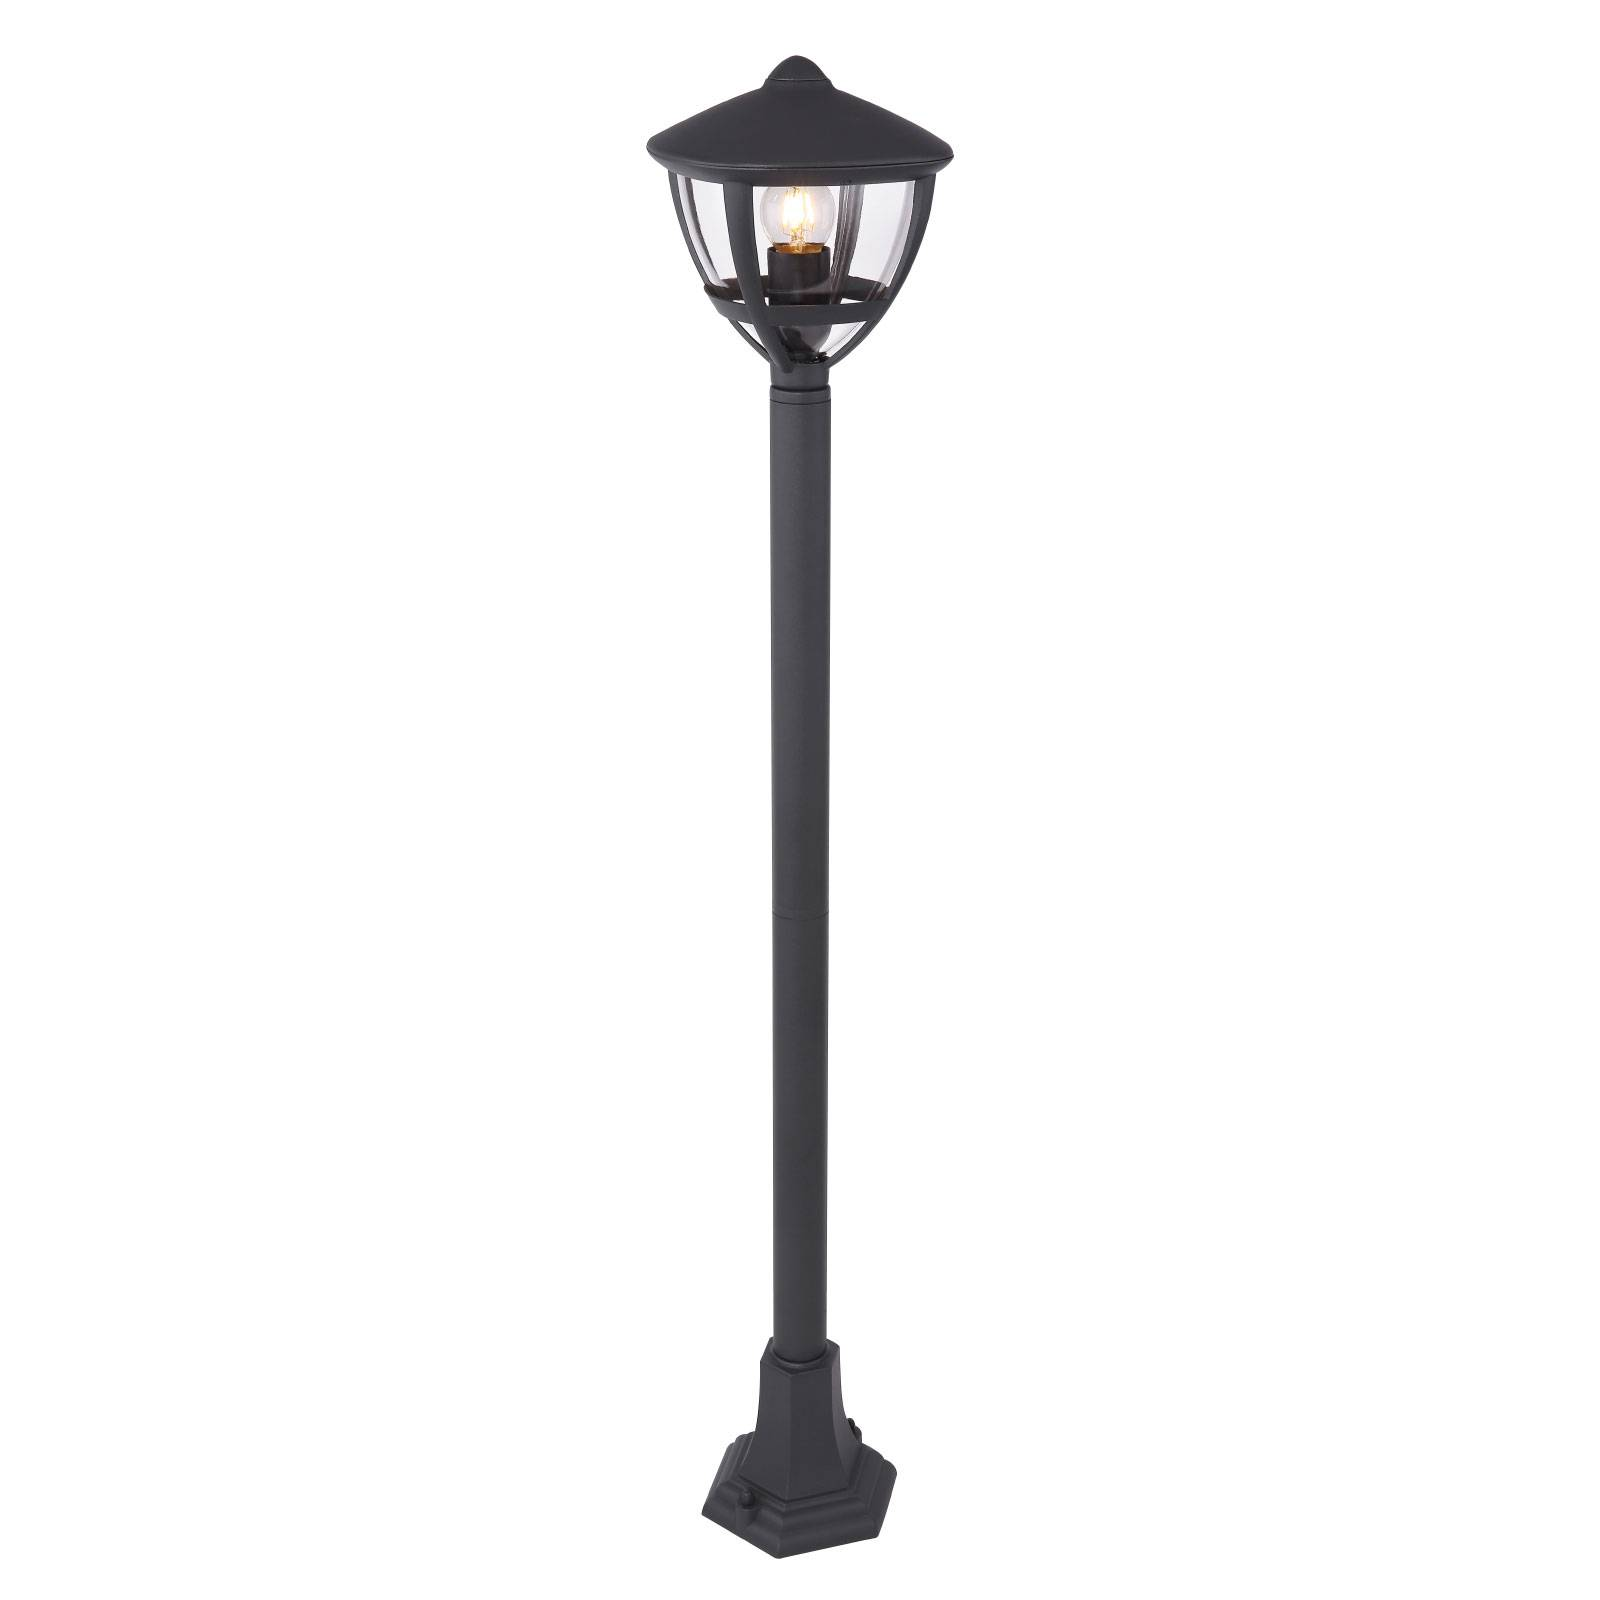 Tuinpadverlichting Nollo in lantaarnvorm, zwart